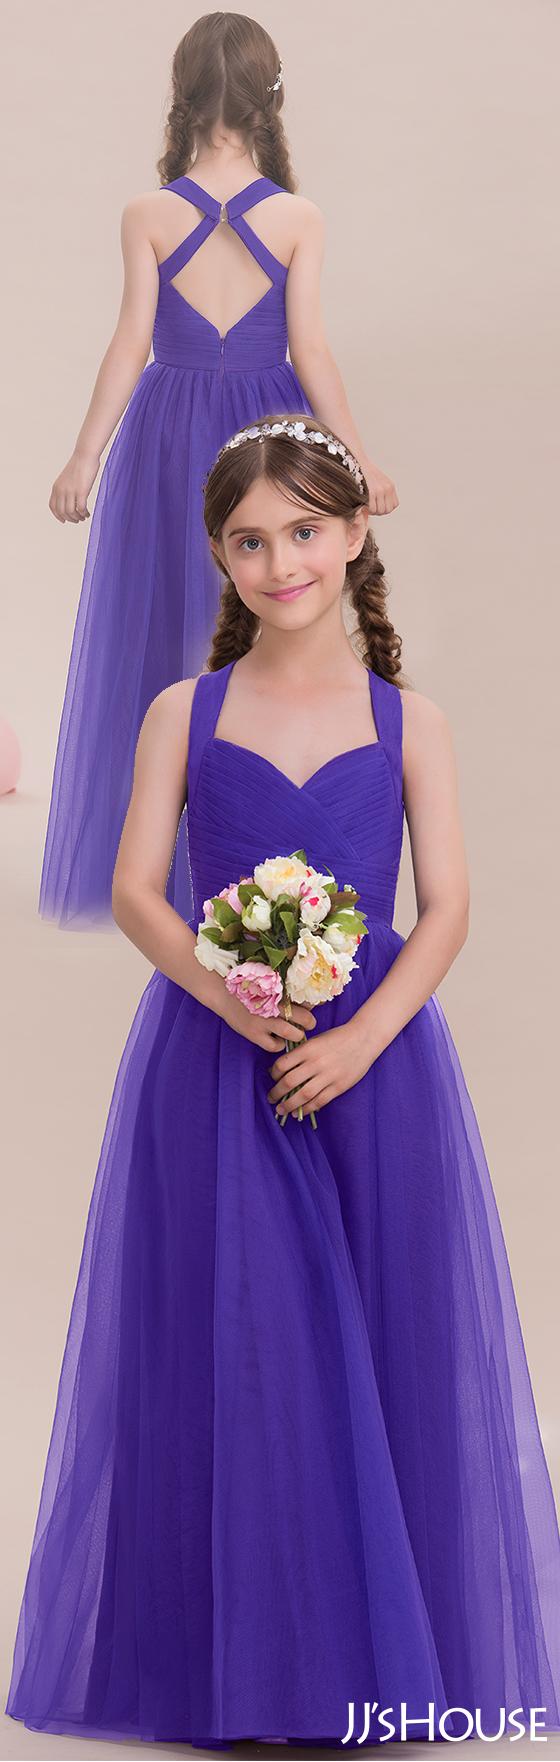 A bright nice dress #JJsHouse #Junior #Bridesmaid   ruha   Pinterest ...